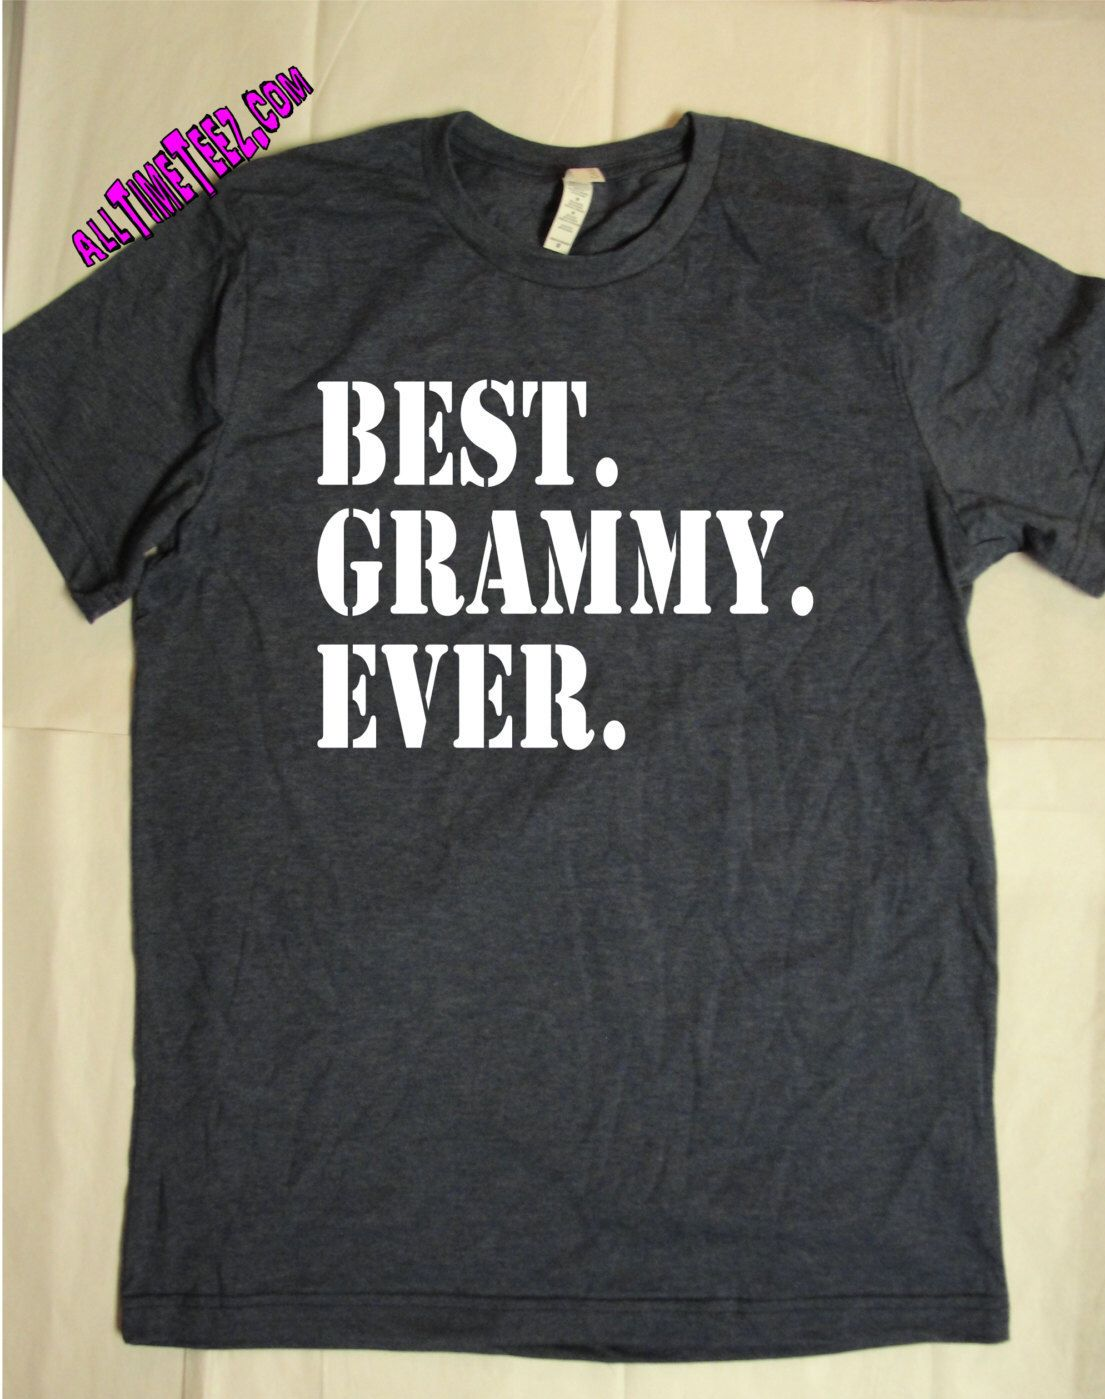 Best Grammy Ever T Shirt - Baby Announcement Shirt - New Grandma, Grandmother, Grammy Shirt - Ships from USA #newgrandma